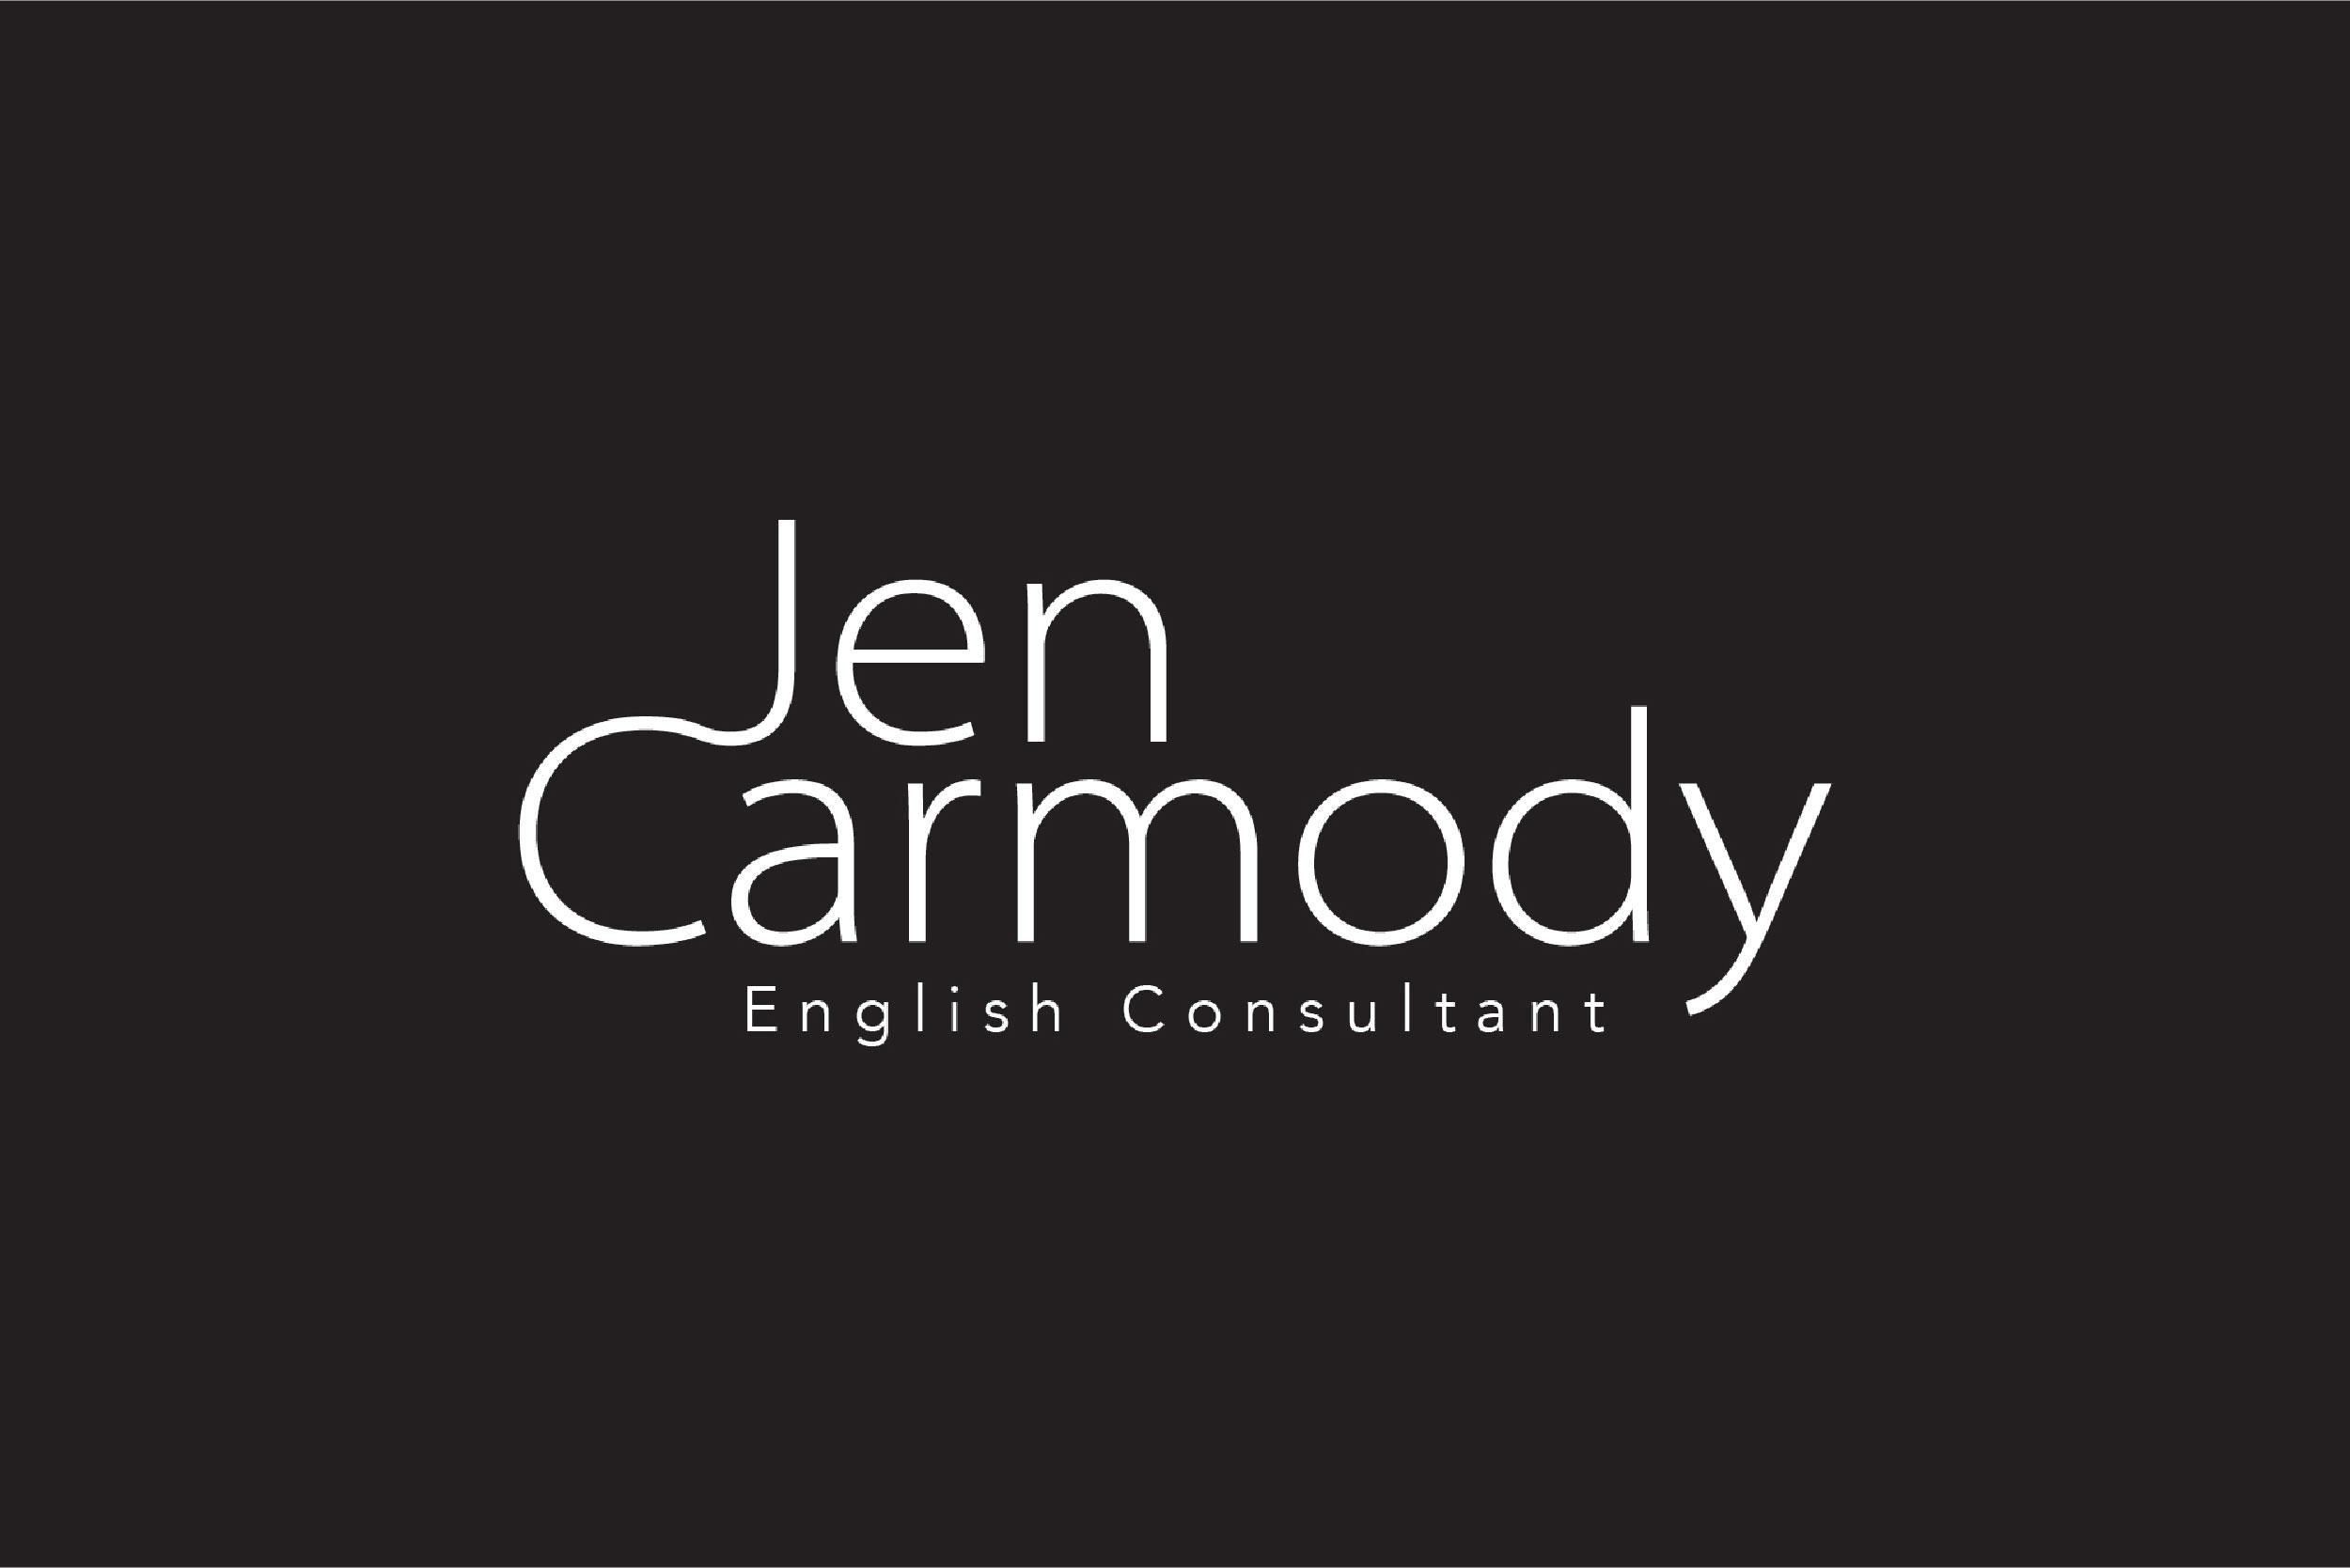 JEN-CARMODY-01.jpg